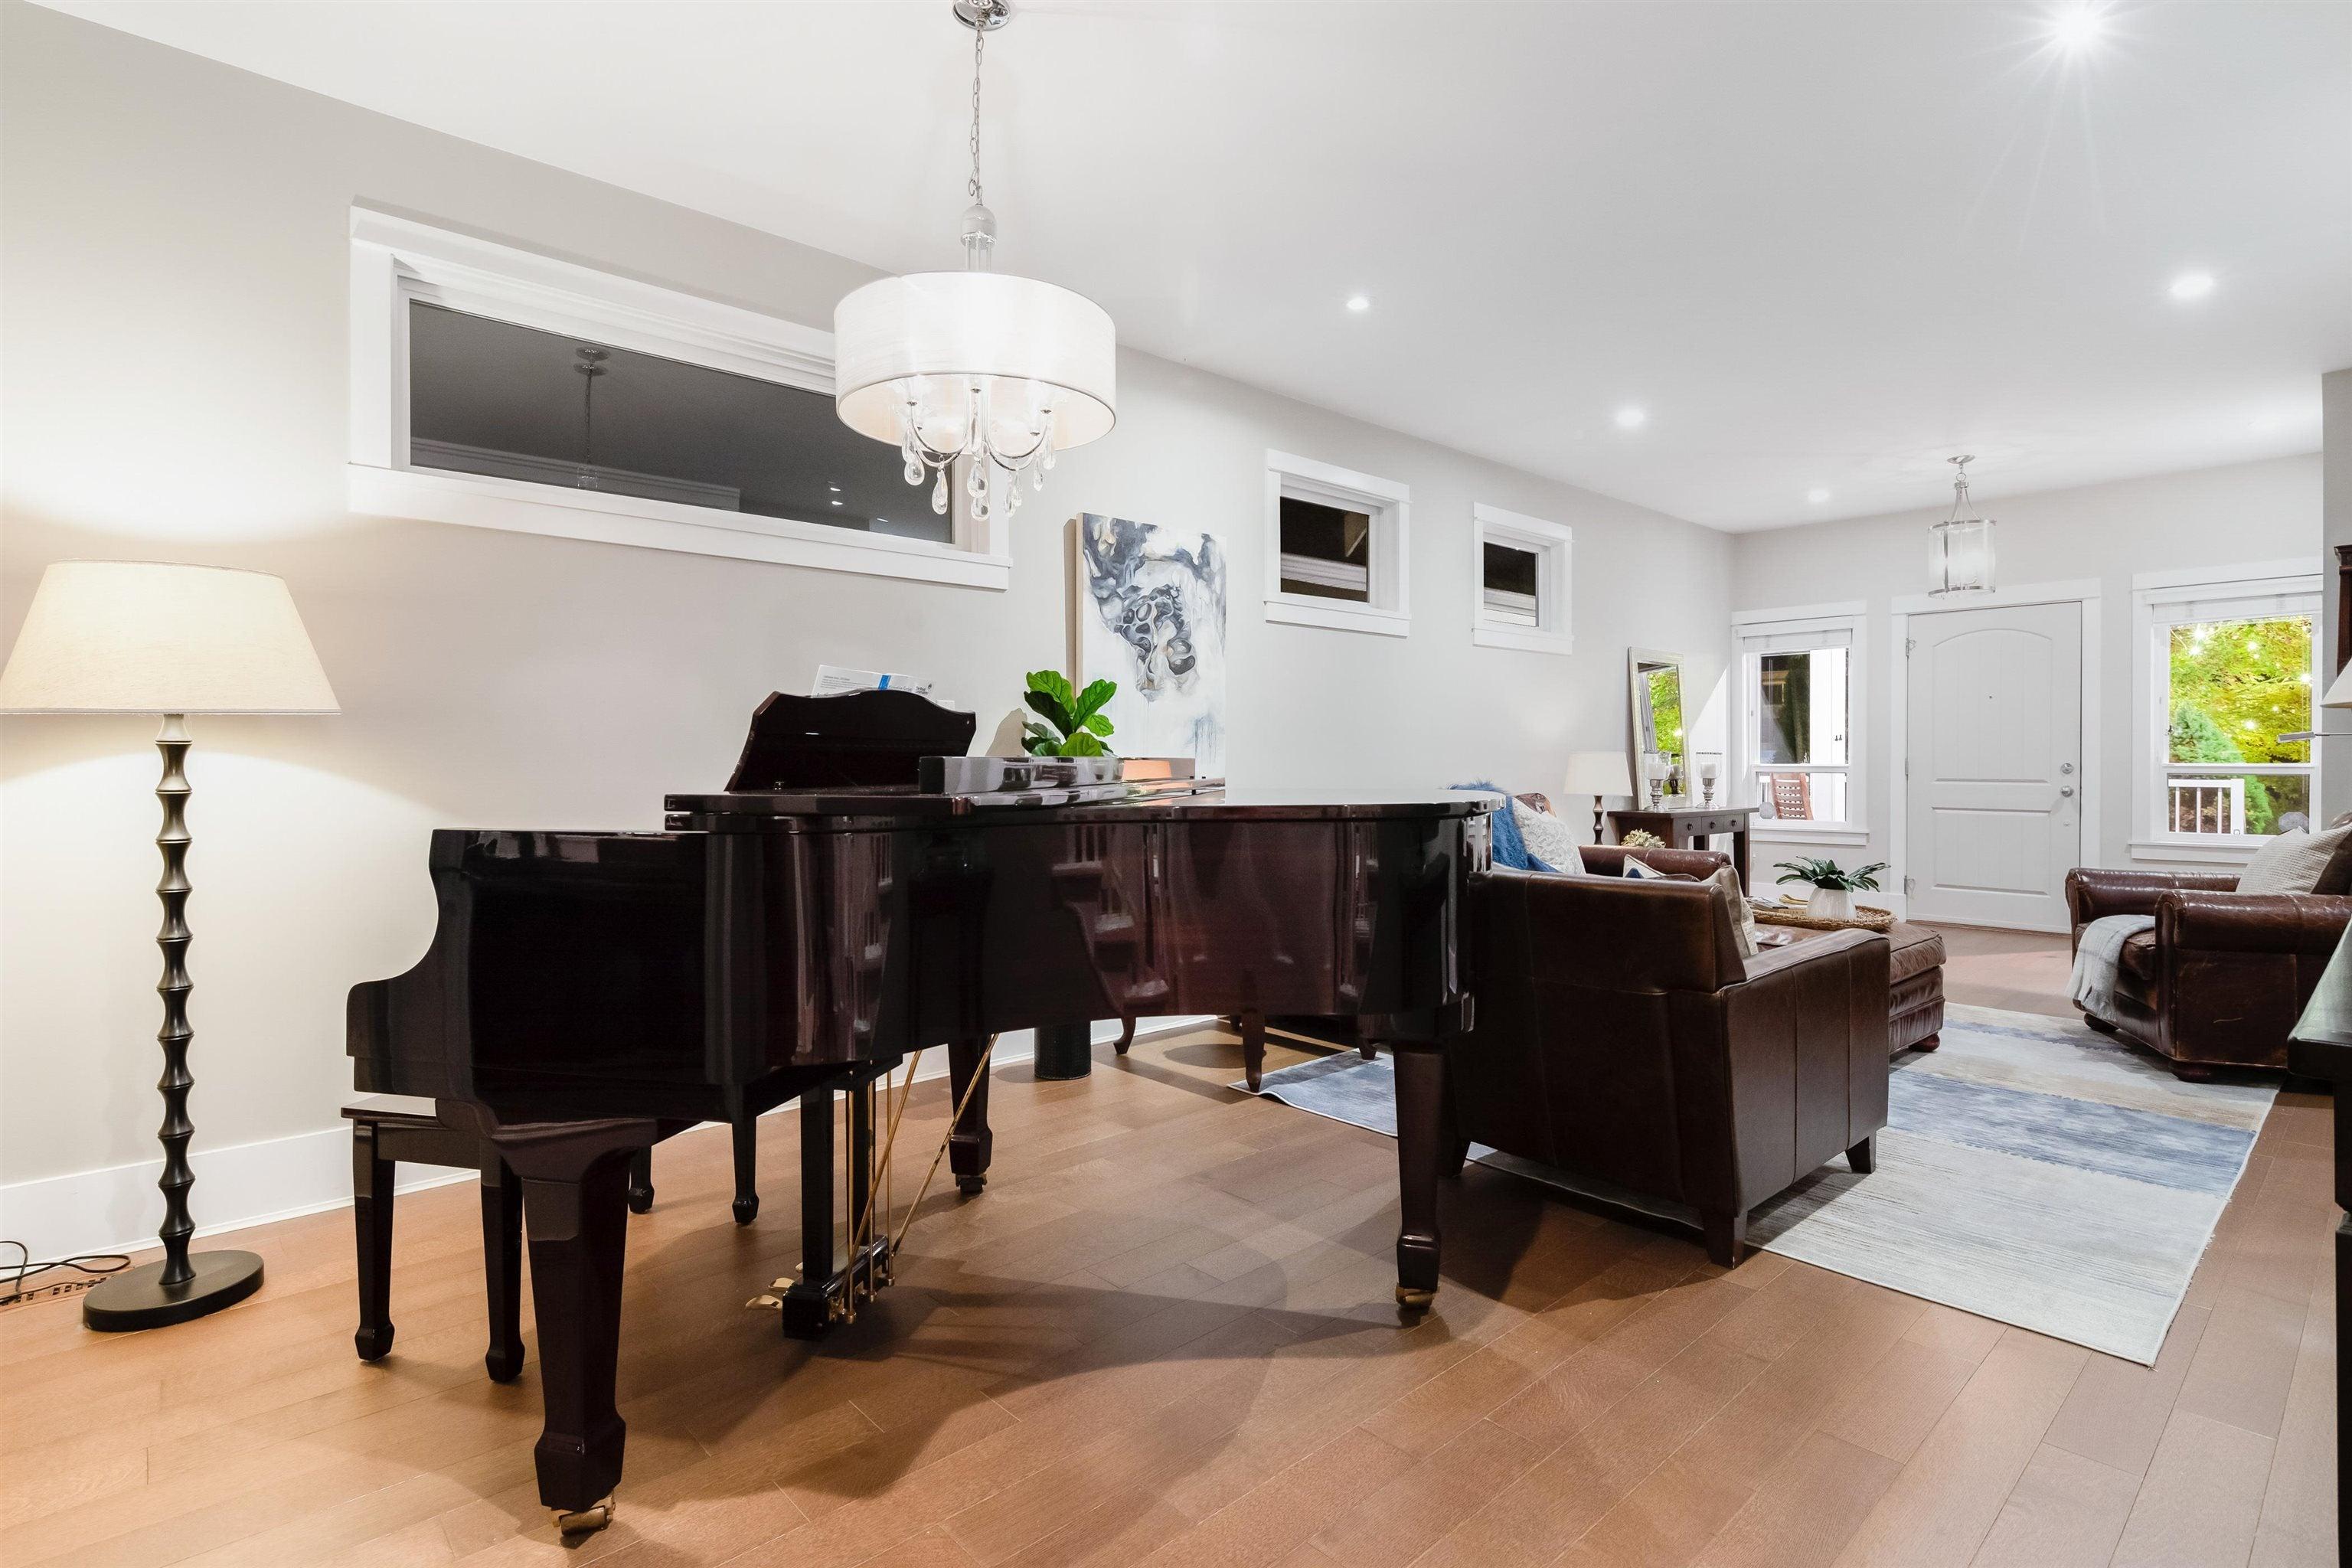 2258 WINDRIDGE DRIVE - Seymour NV House/Single Family for sale, 5 Bedrooms (R2617156) - #17